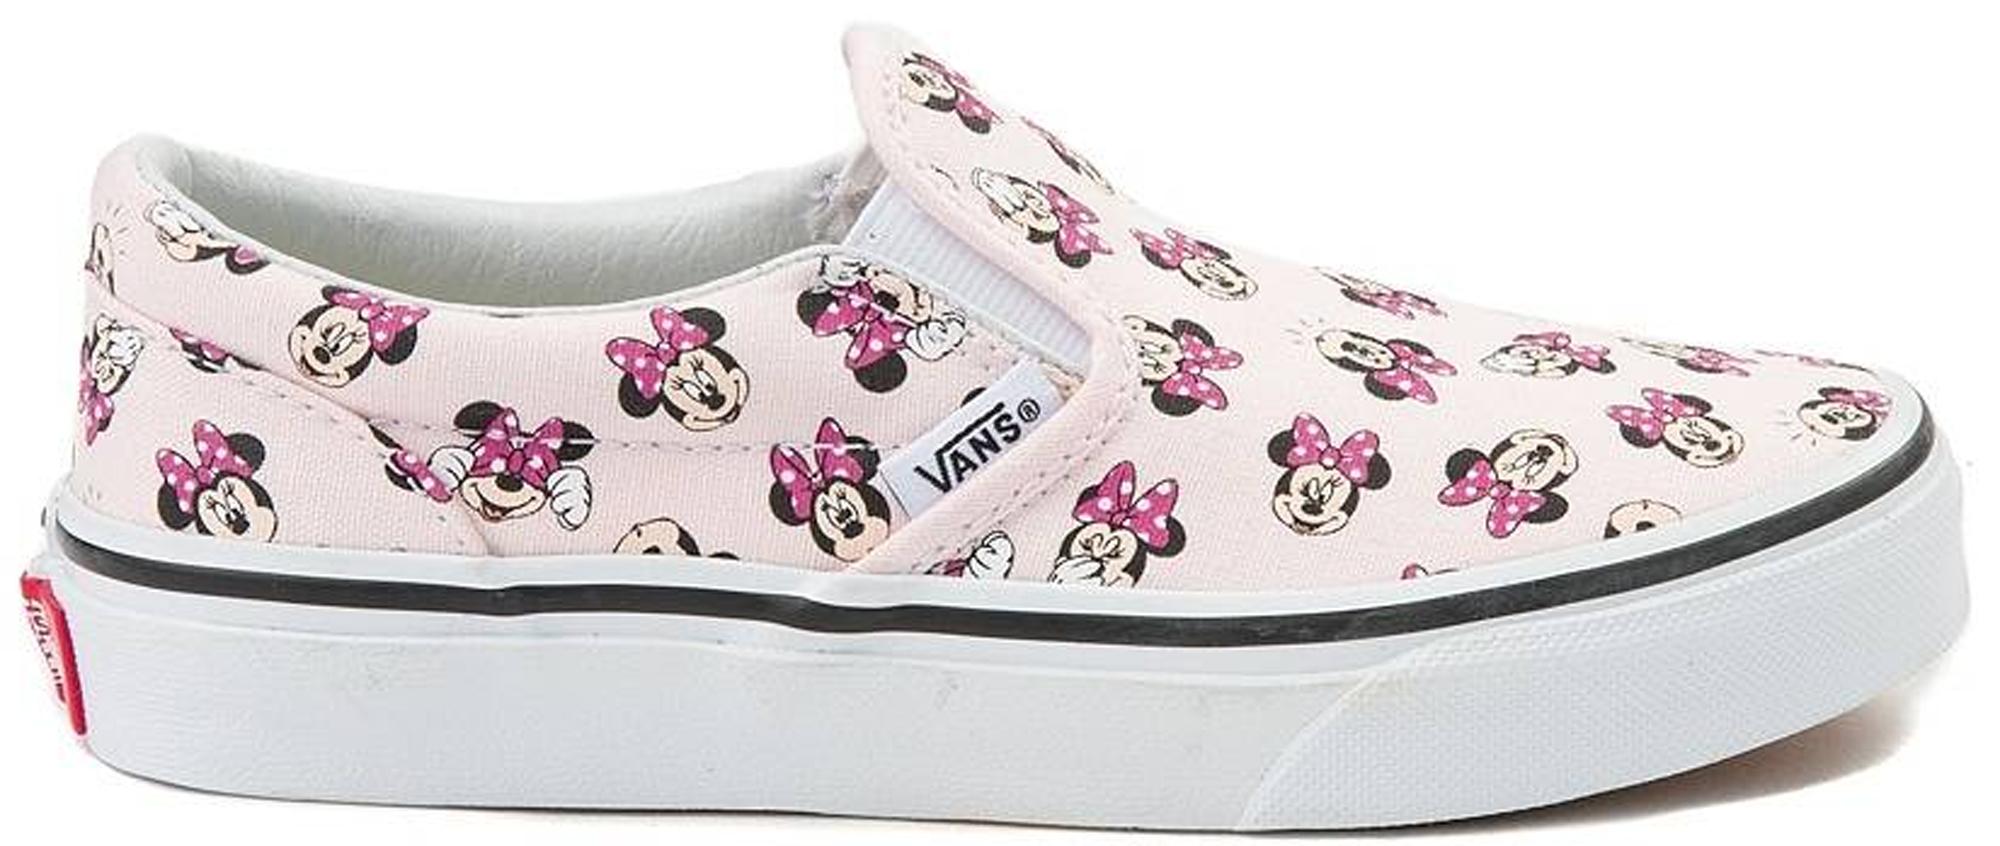 Vans Slip-On Disney Minnie Mouse (PS